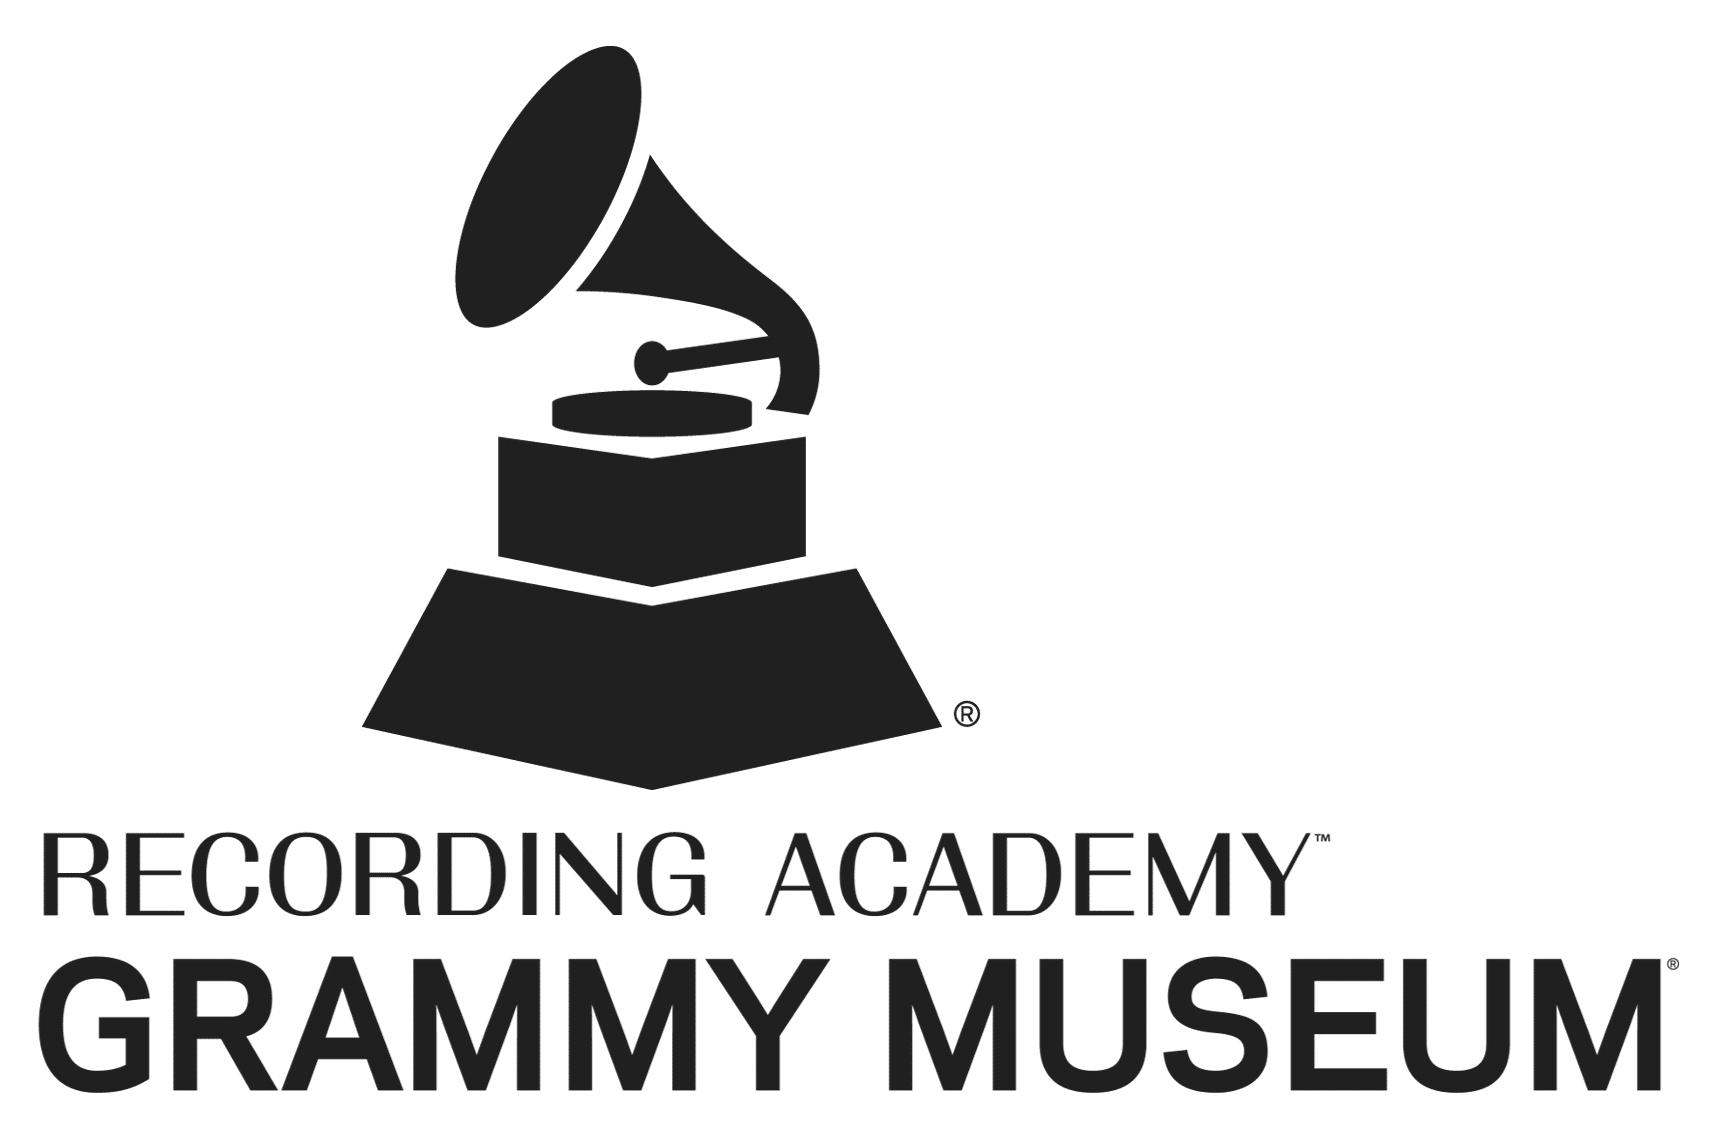 The GRAMMY Museum - logo